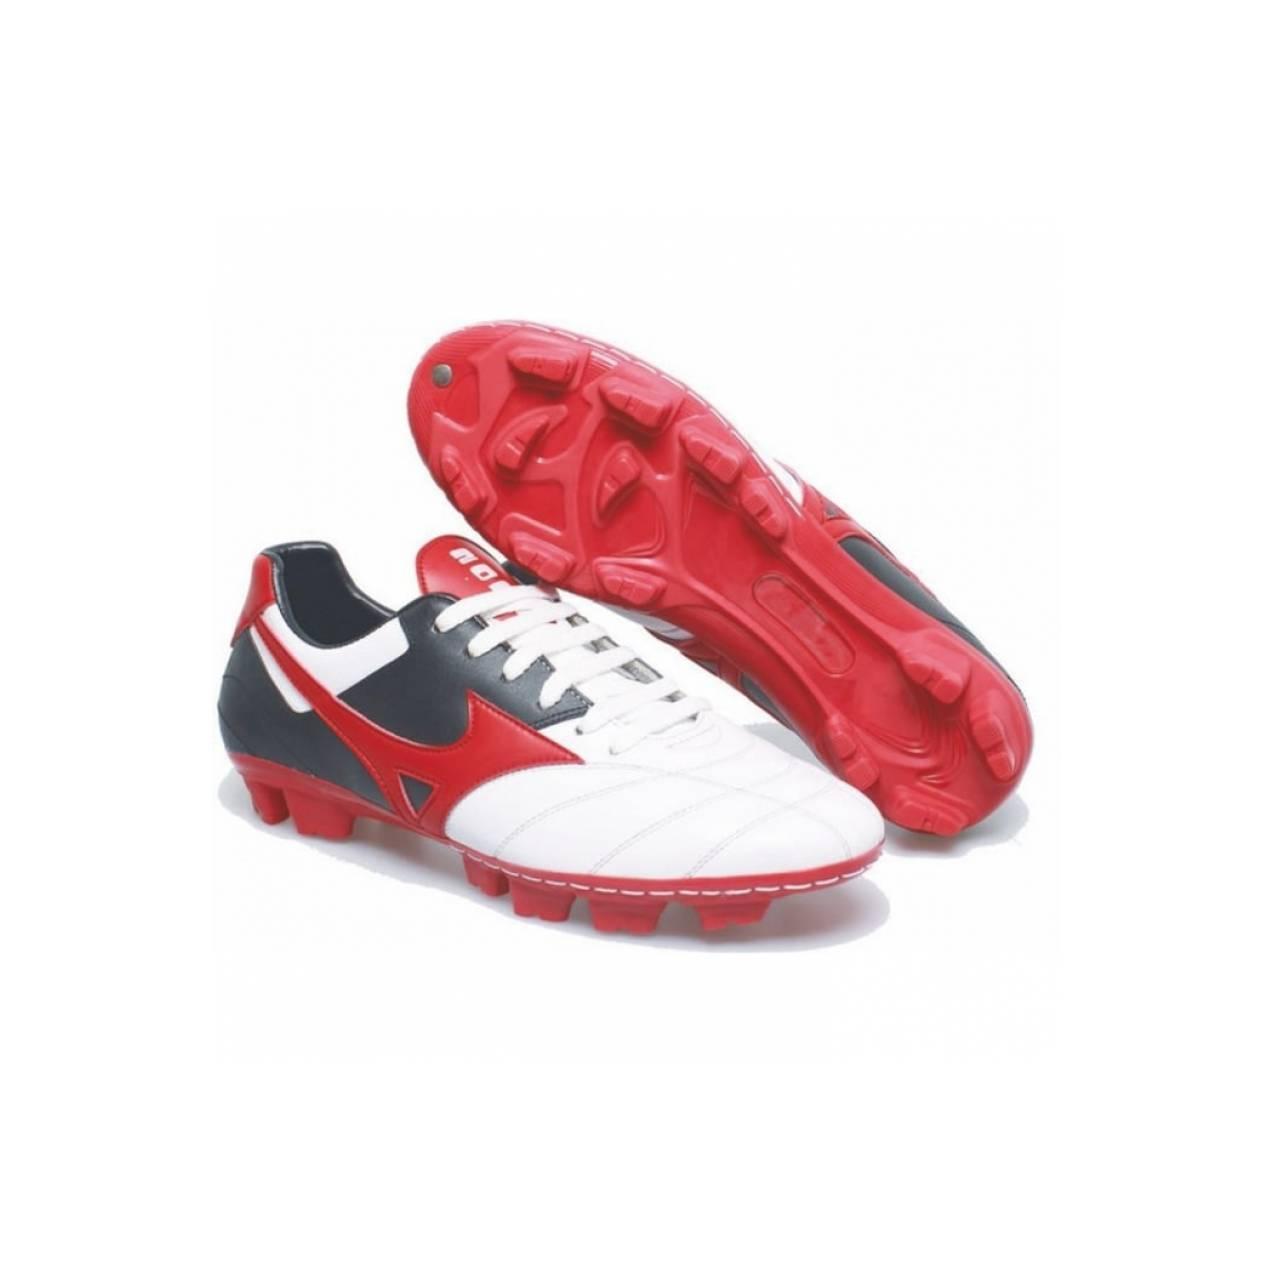 sepatu bola putihmerah bahan KULIT sepatu sepakbola murahba T2909